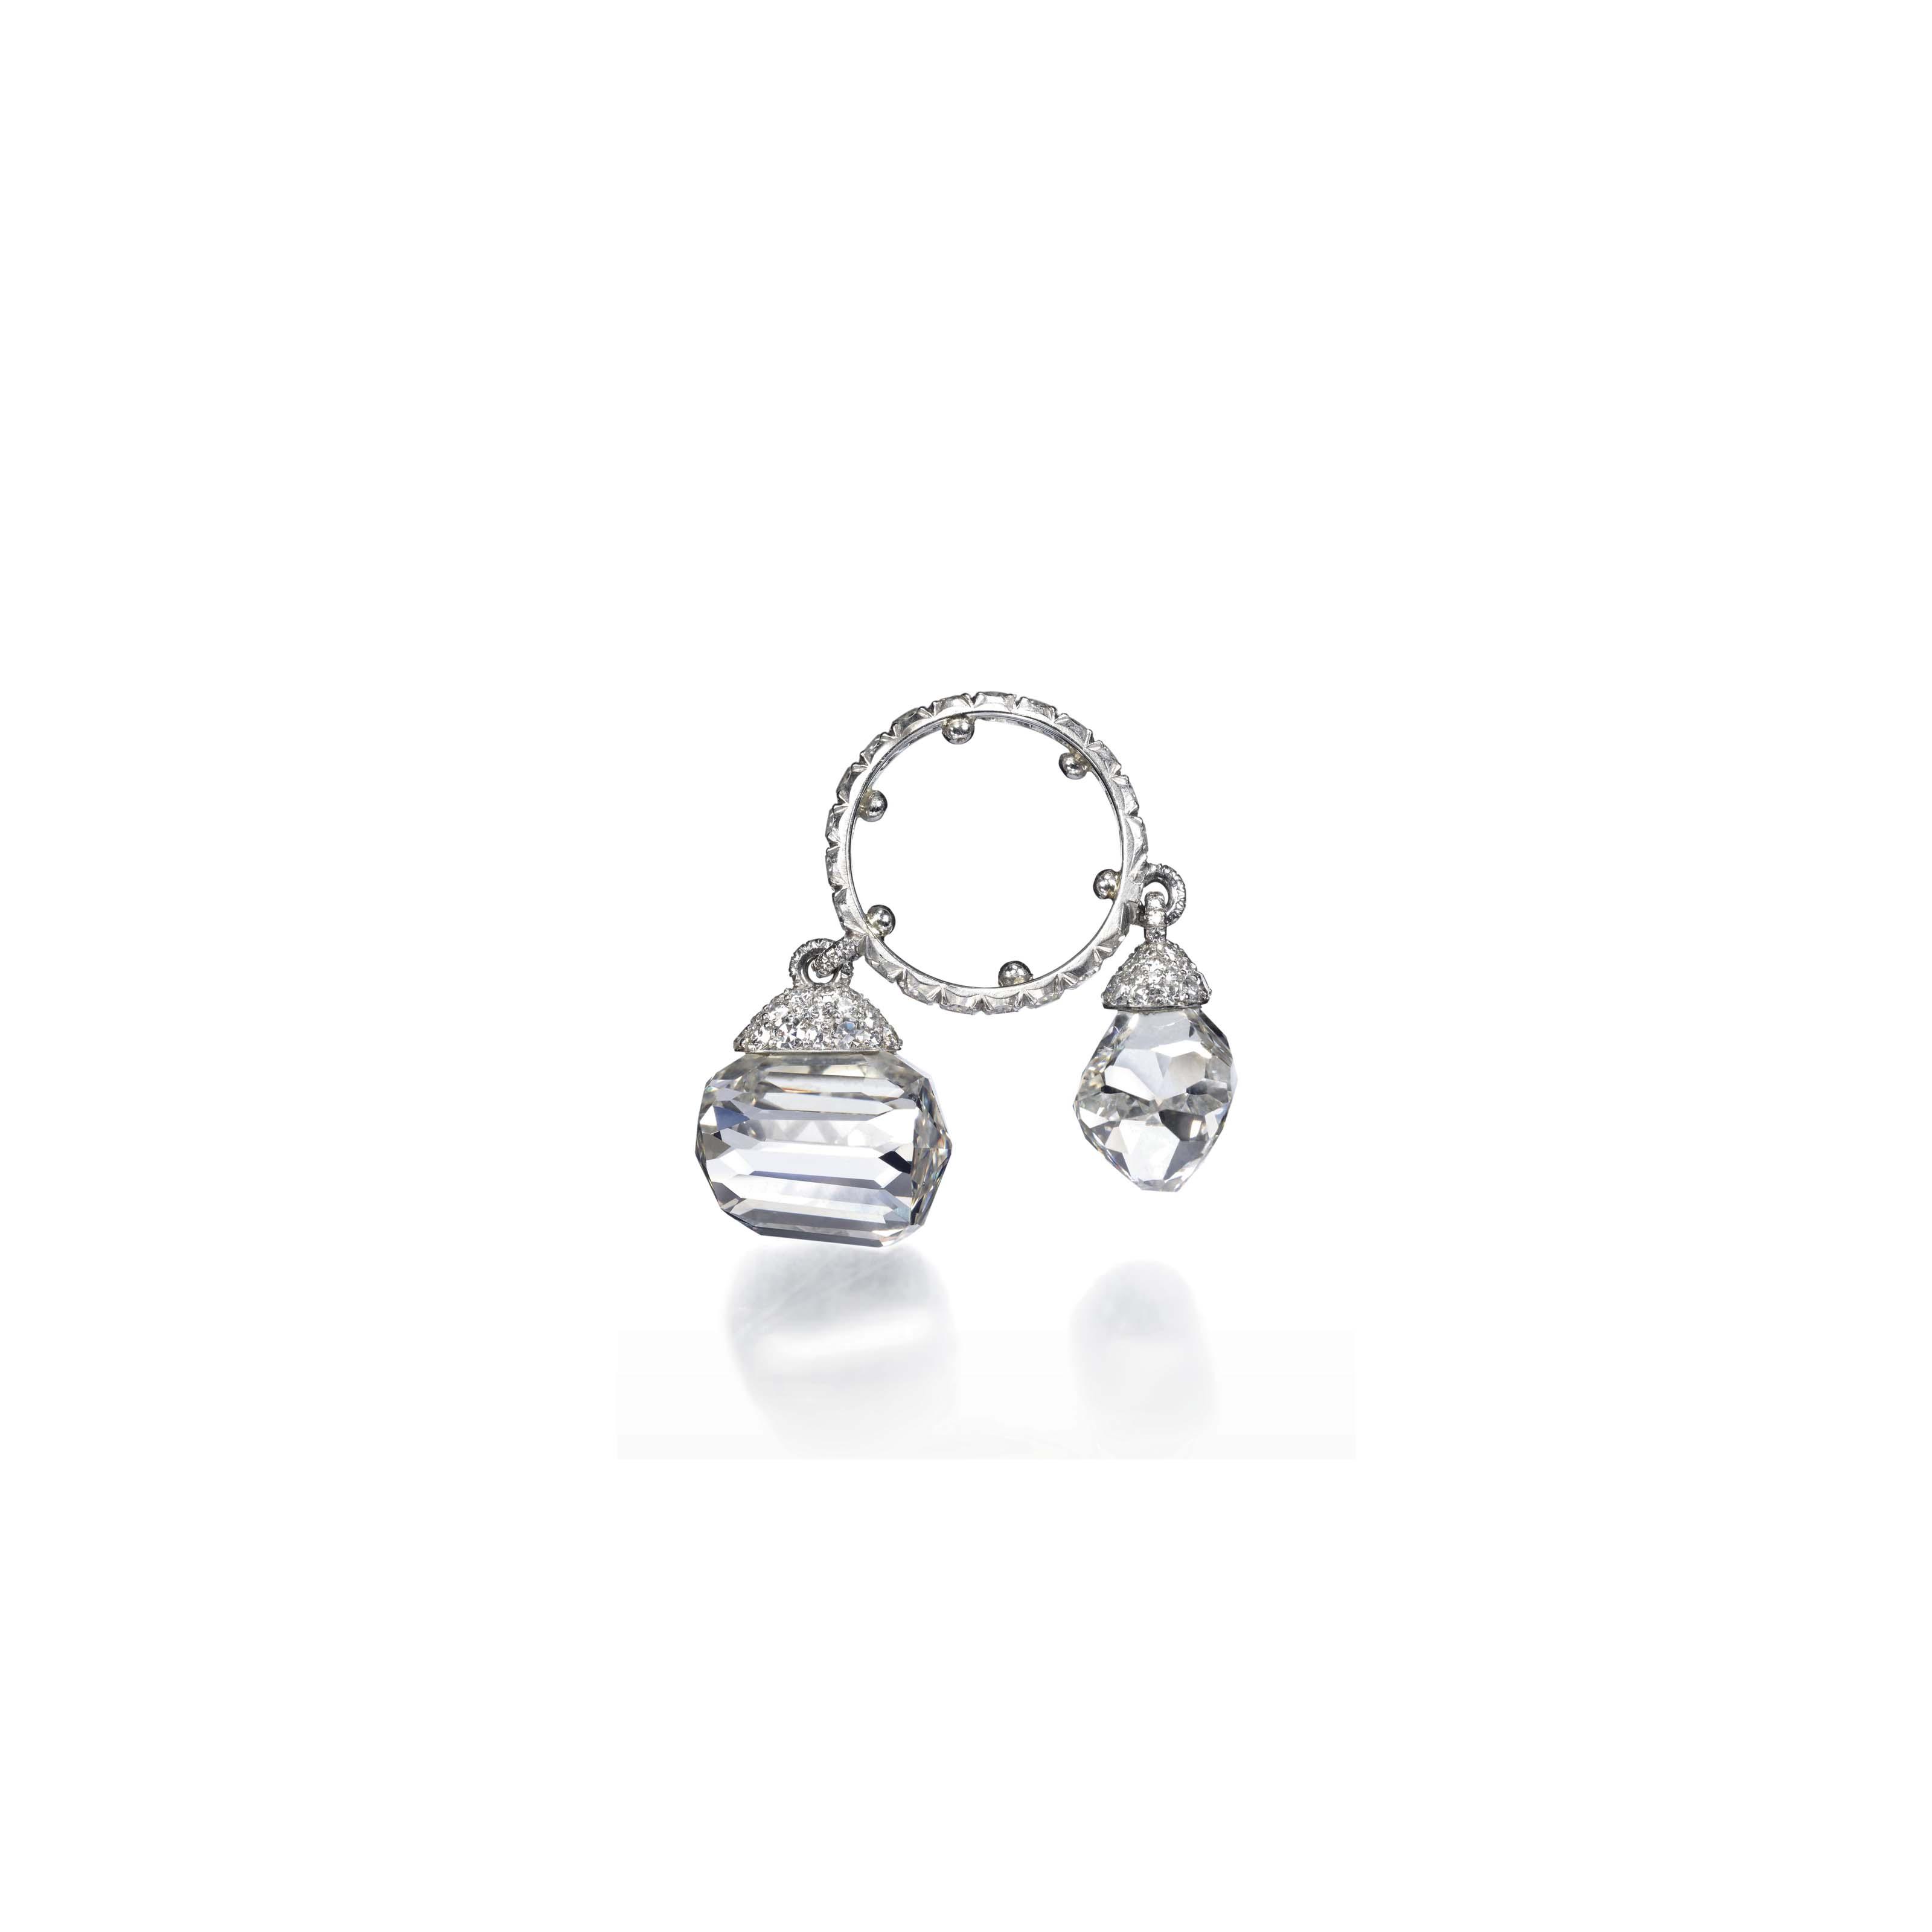 A DIAMOND CHARM RING, BY JAR